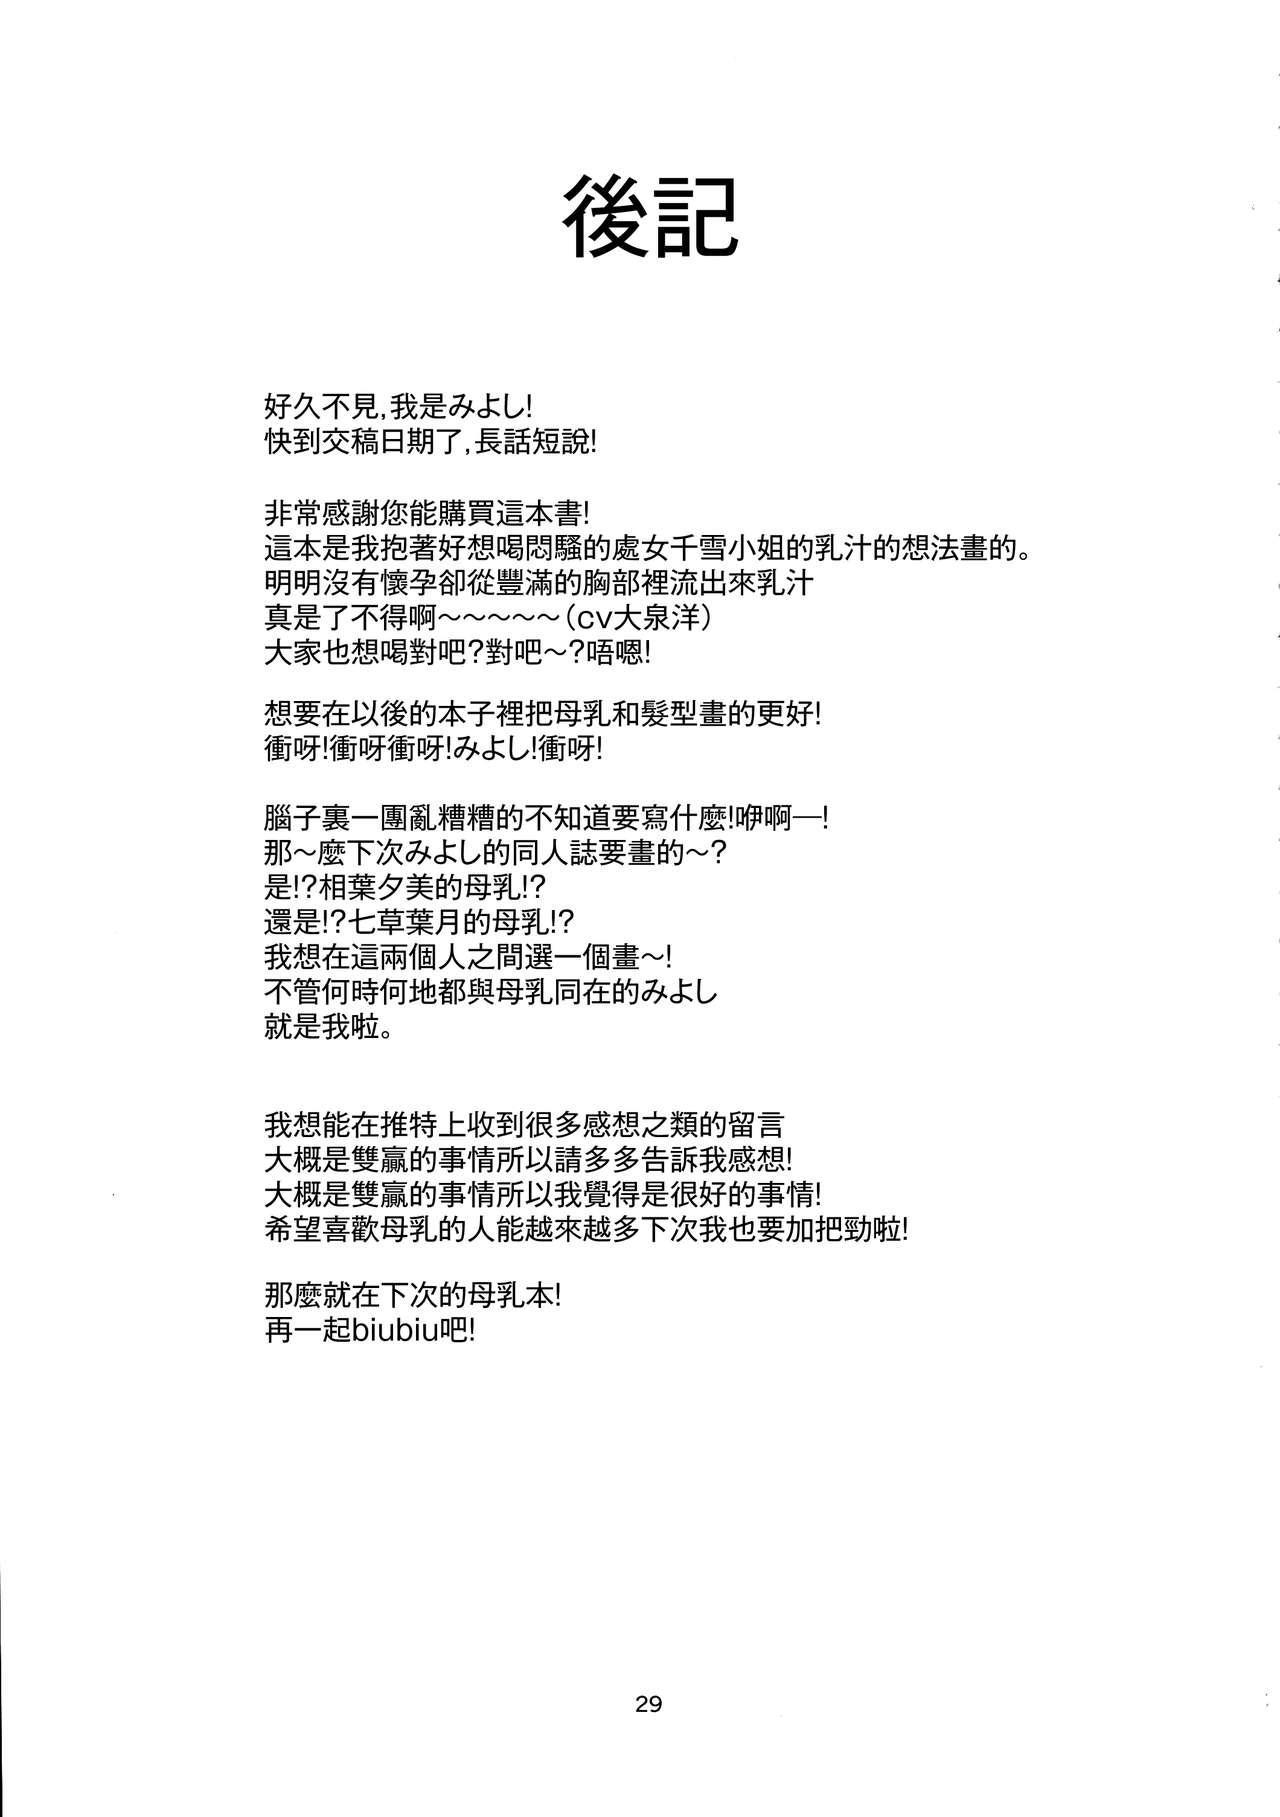 Eh!? Kuwayama Chiyuki kara Bonyuu ga!? 29